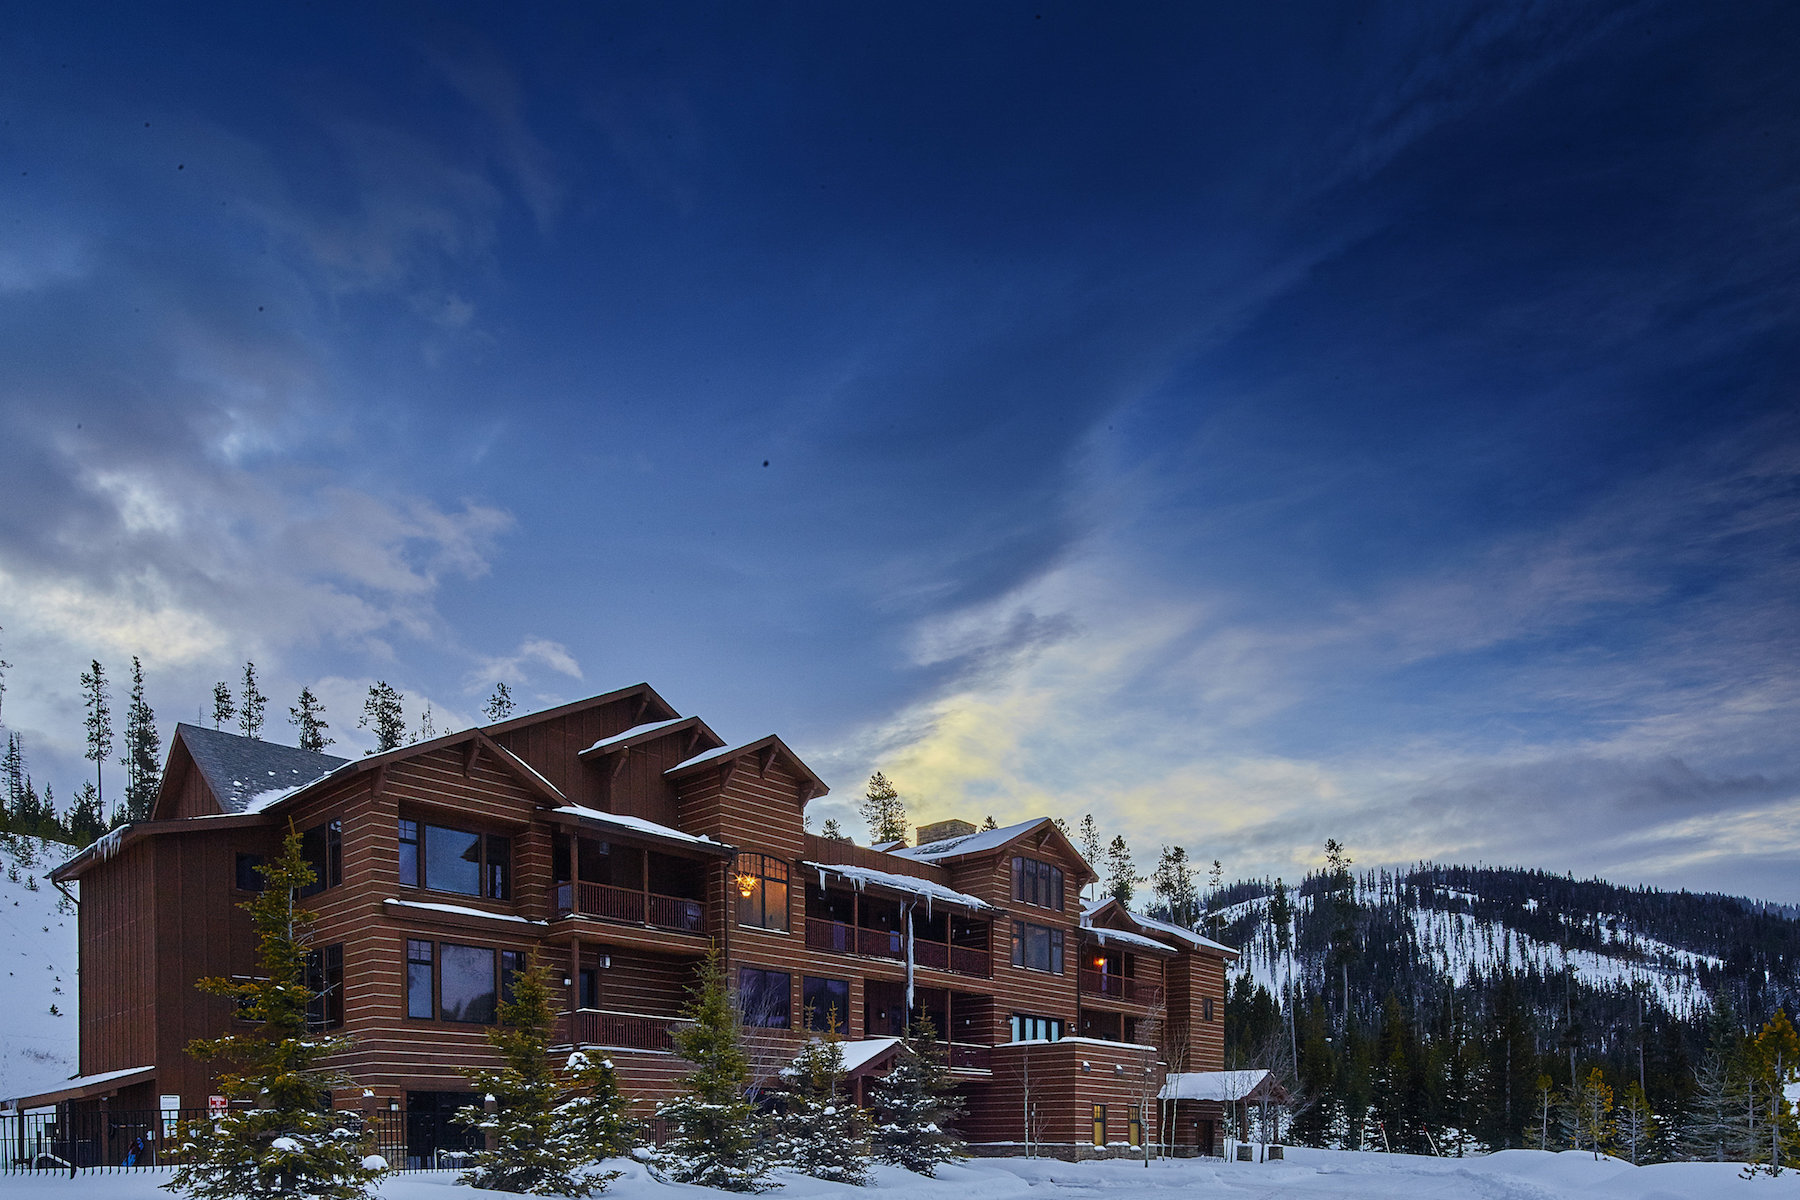 Condominium for Sale at Mountain Lake Ski Condo 2 Summit View Drive Unit 303 PH1 Big Sky, Montana 59716 United States